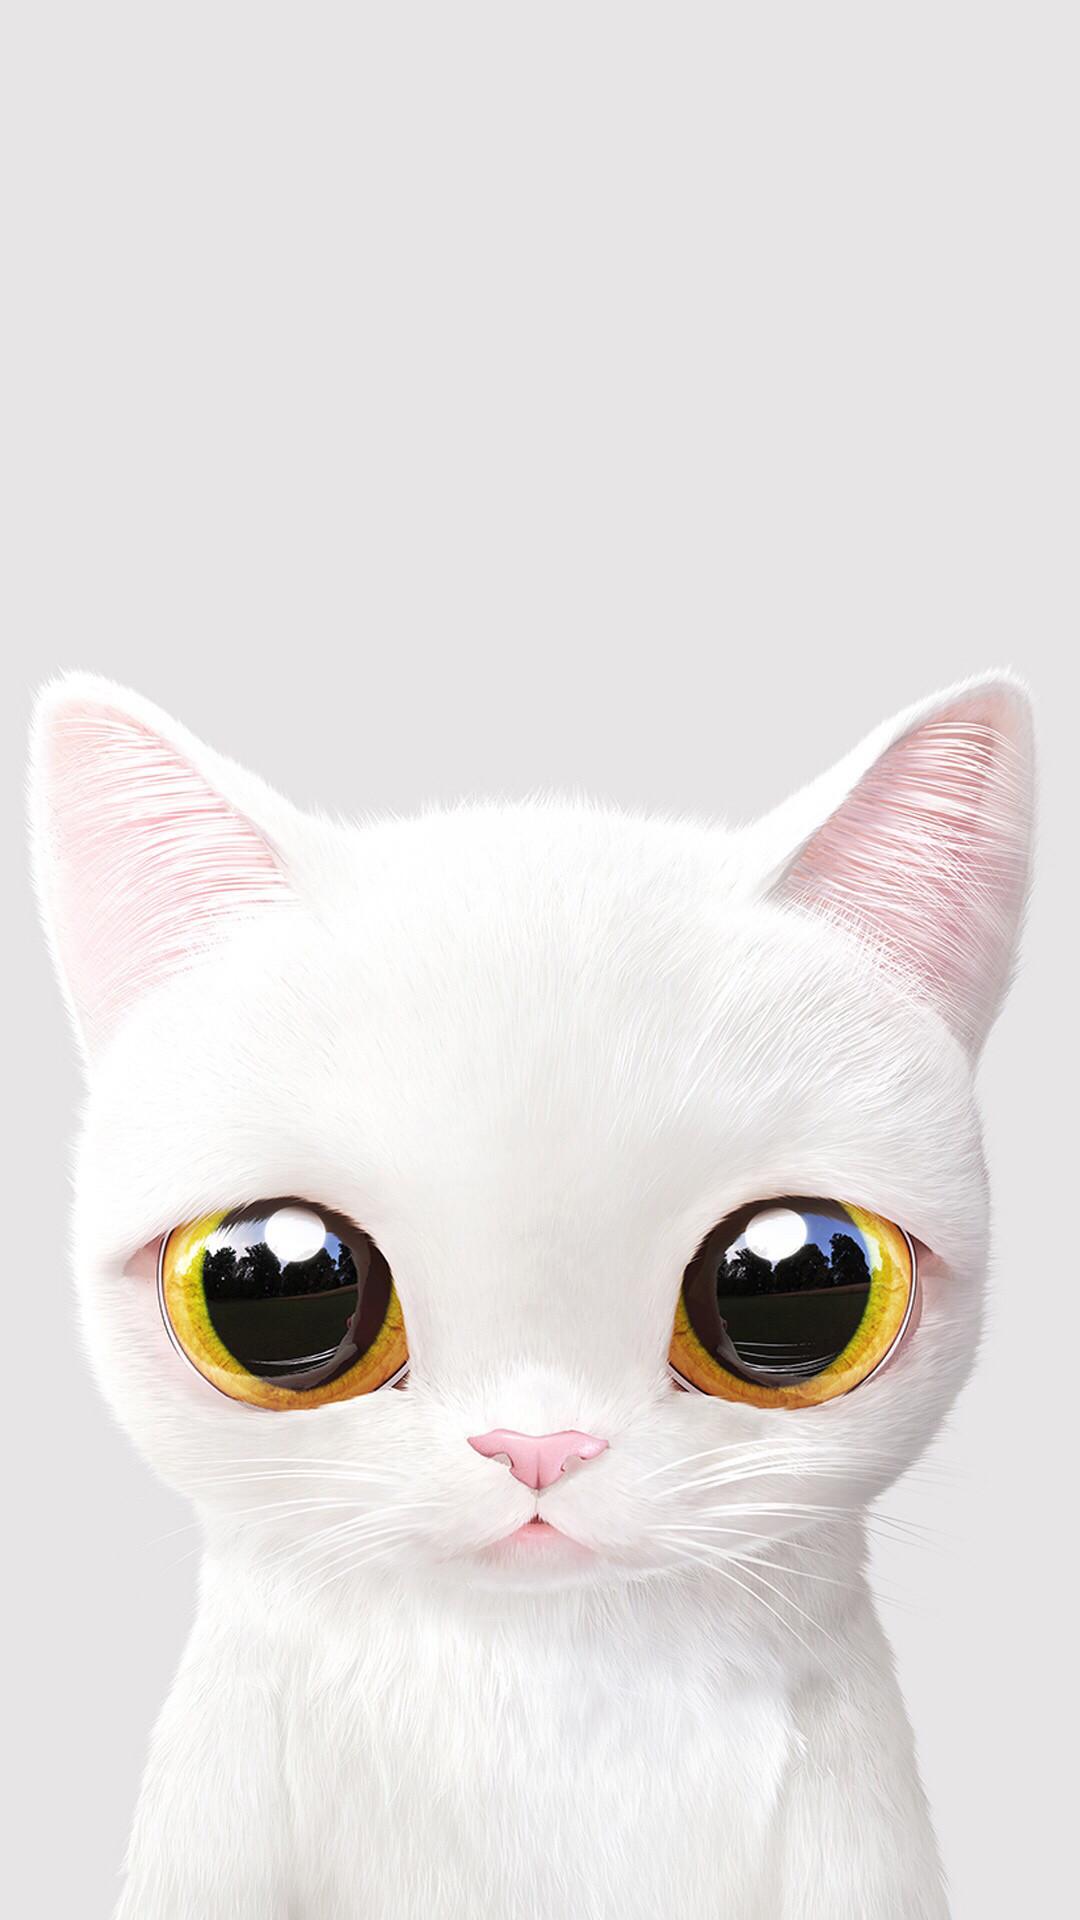 Cute cartoon cat wallpaper 71 images - Caterpillar wallpaper ...